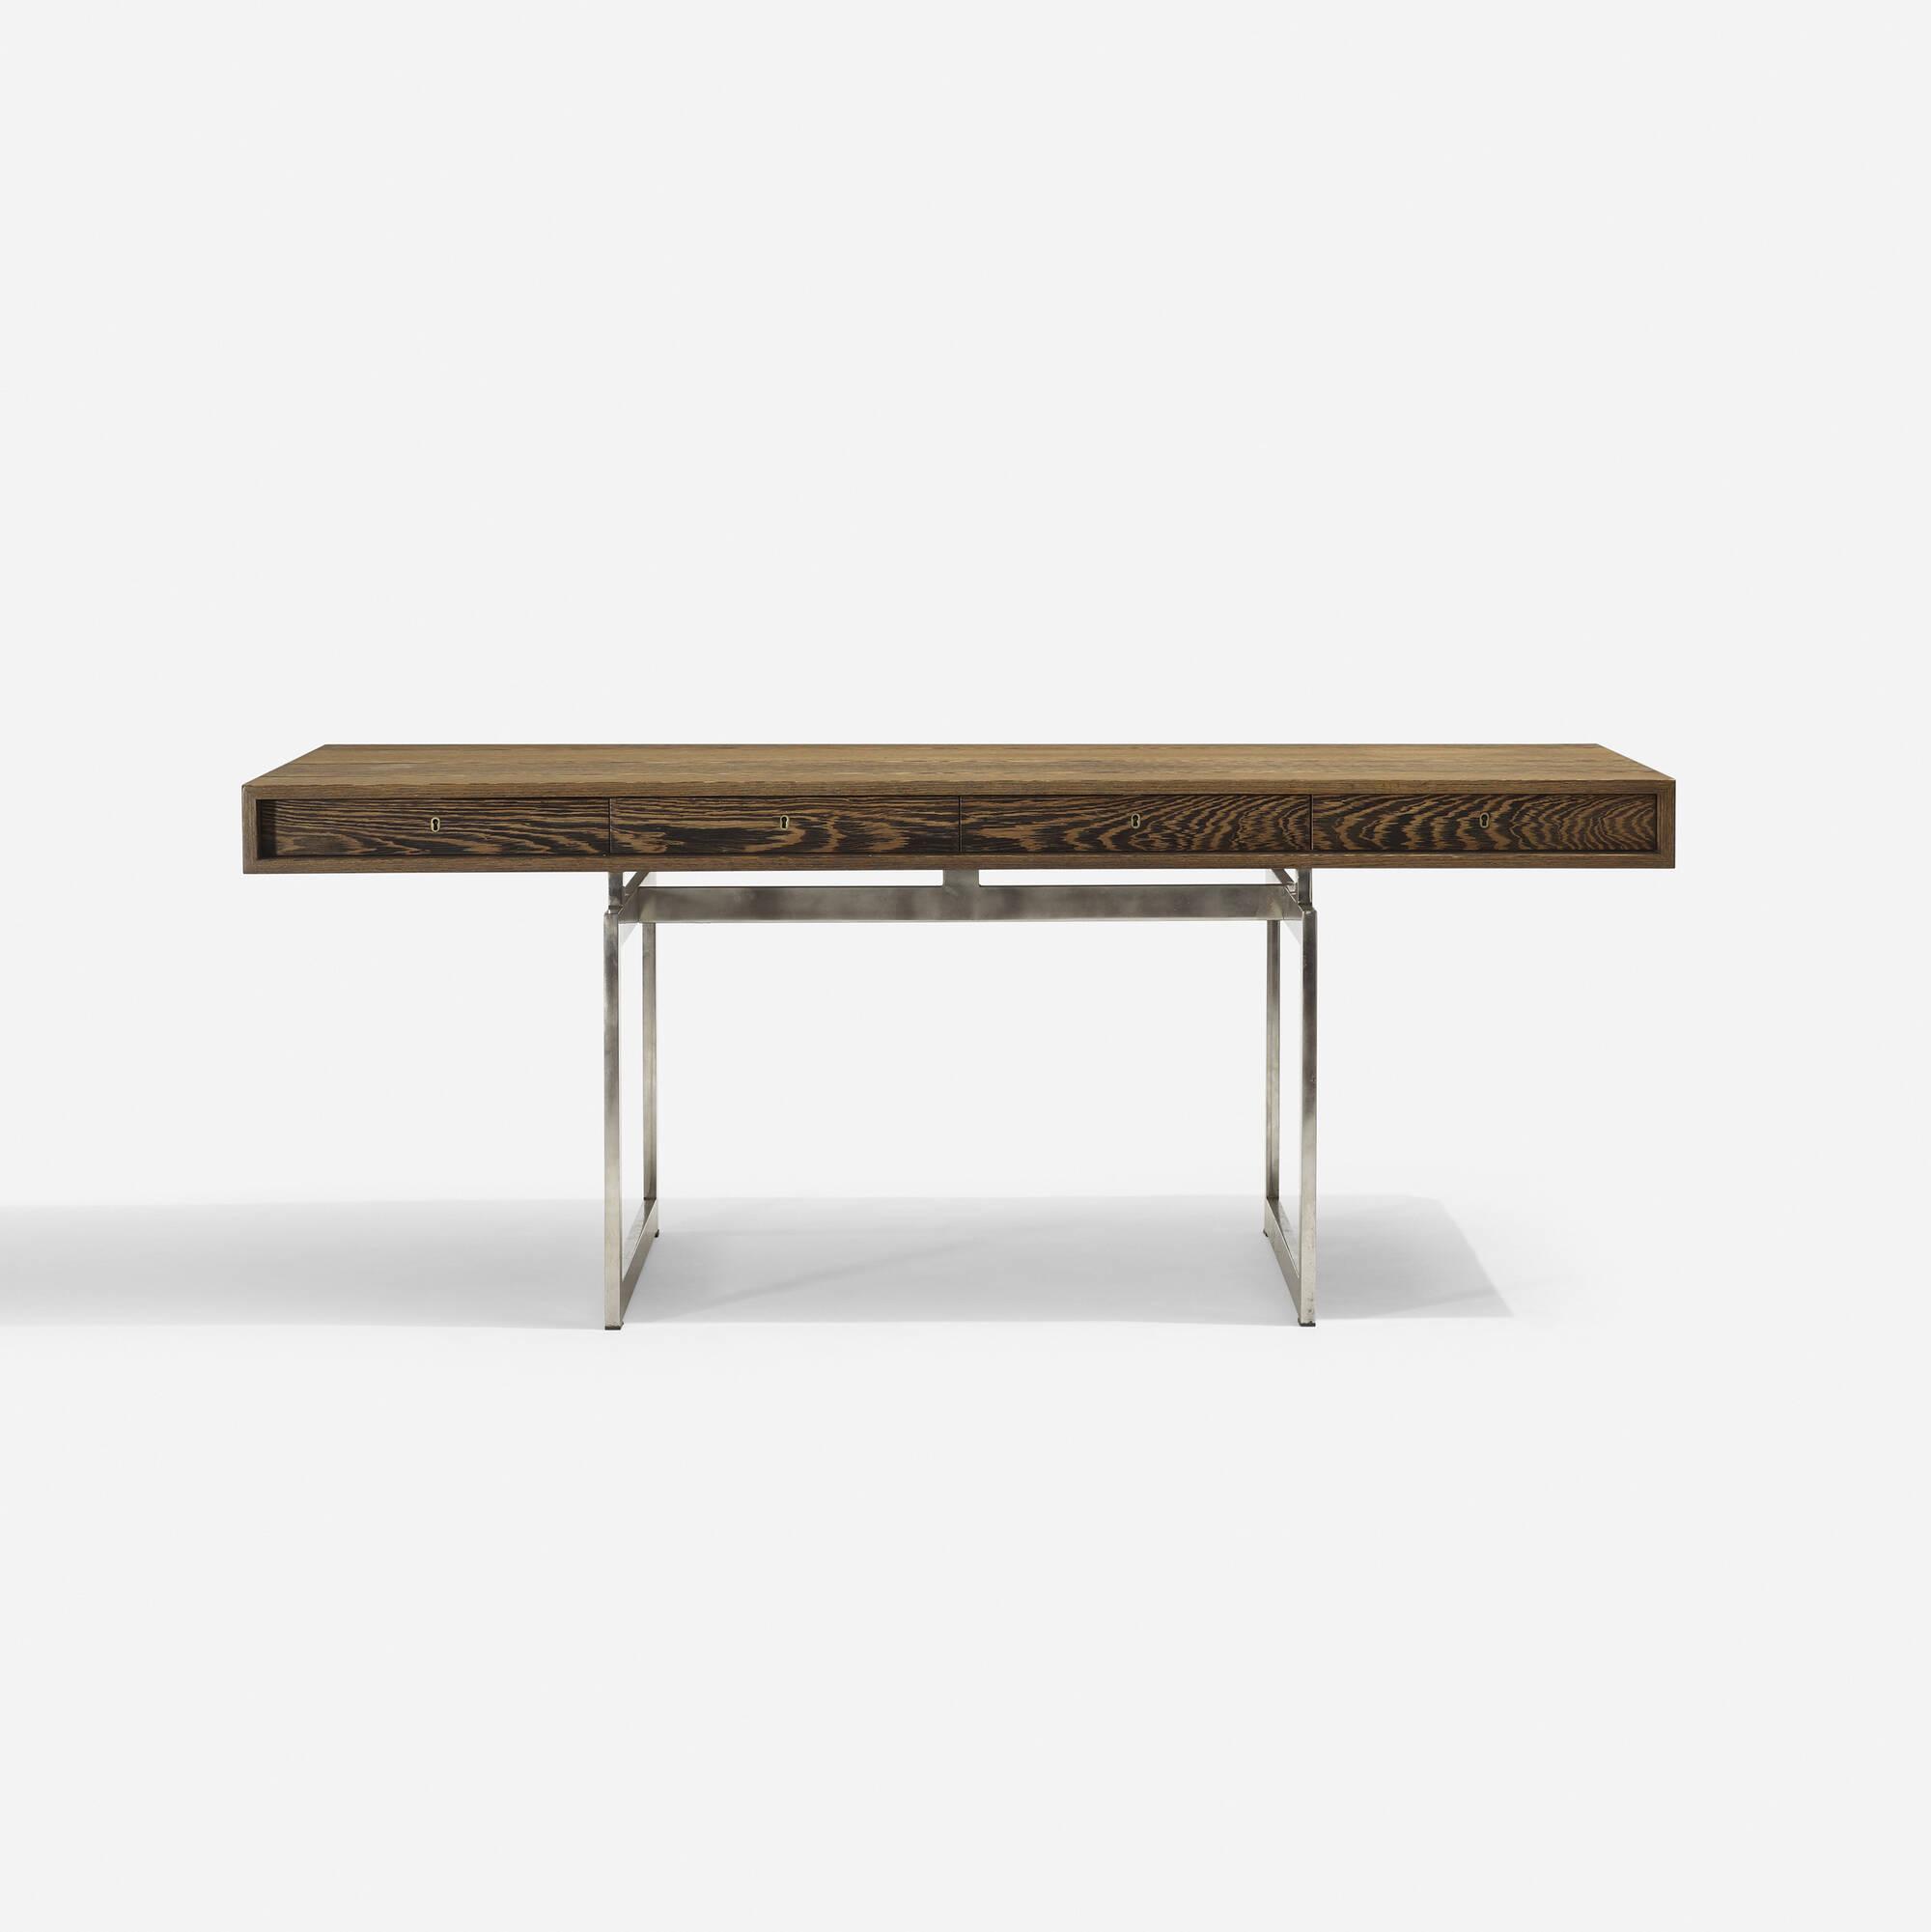 238 Bodil Kjaer Desk 2 Of 4